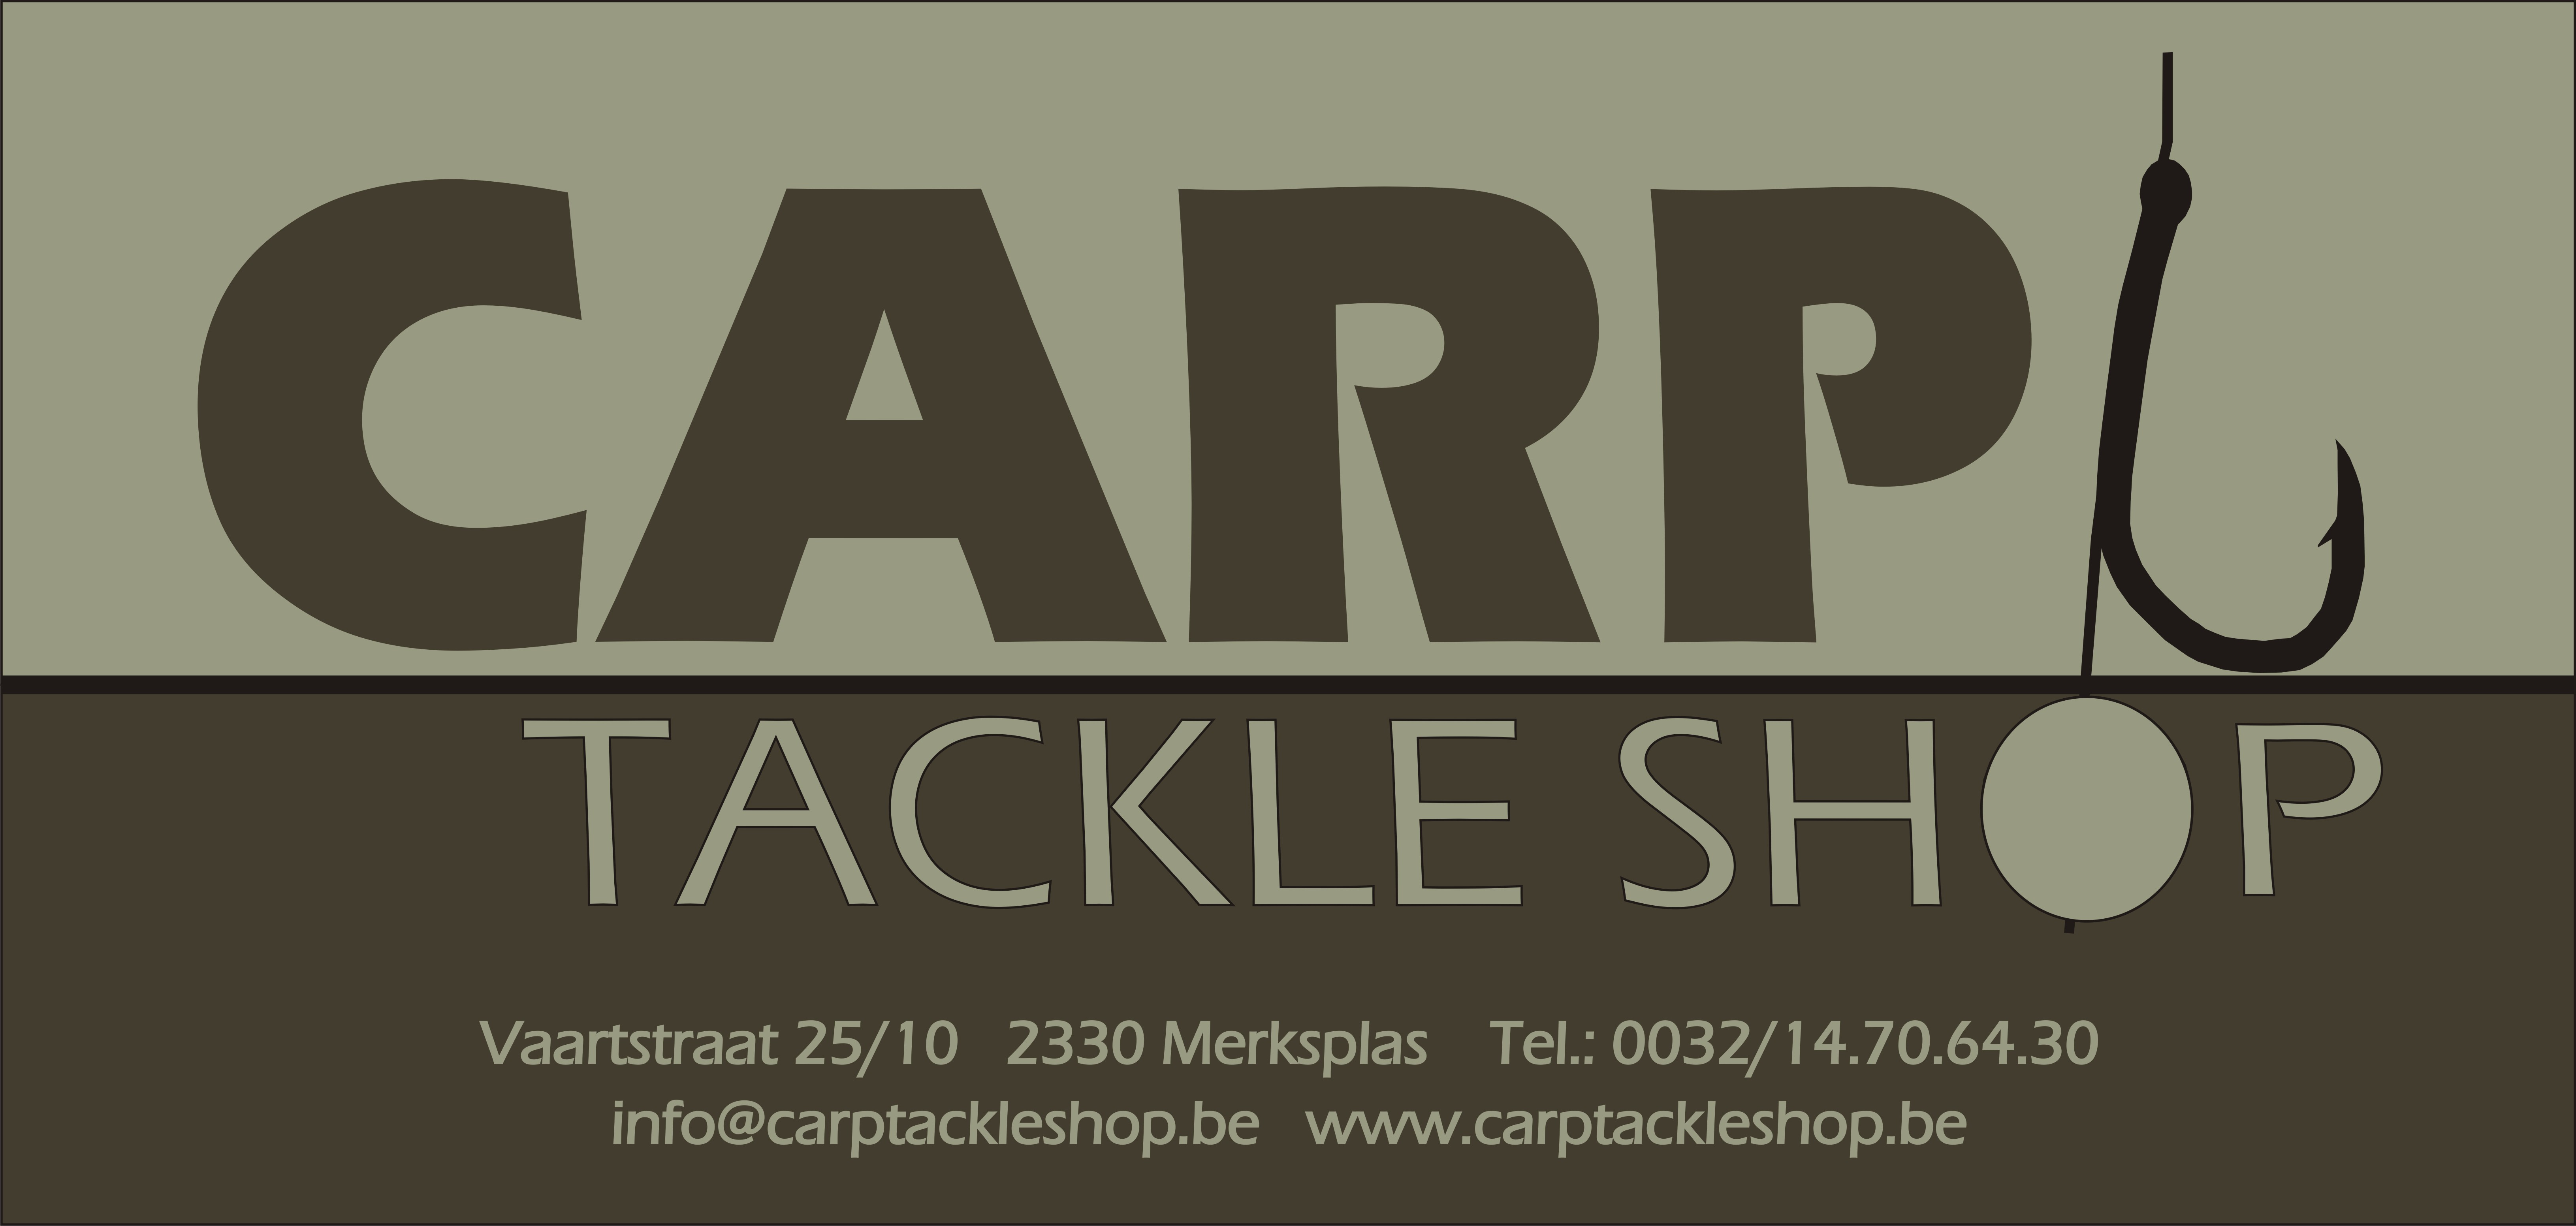 CarpTackle Shop